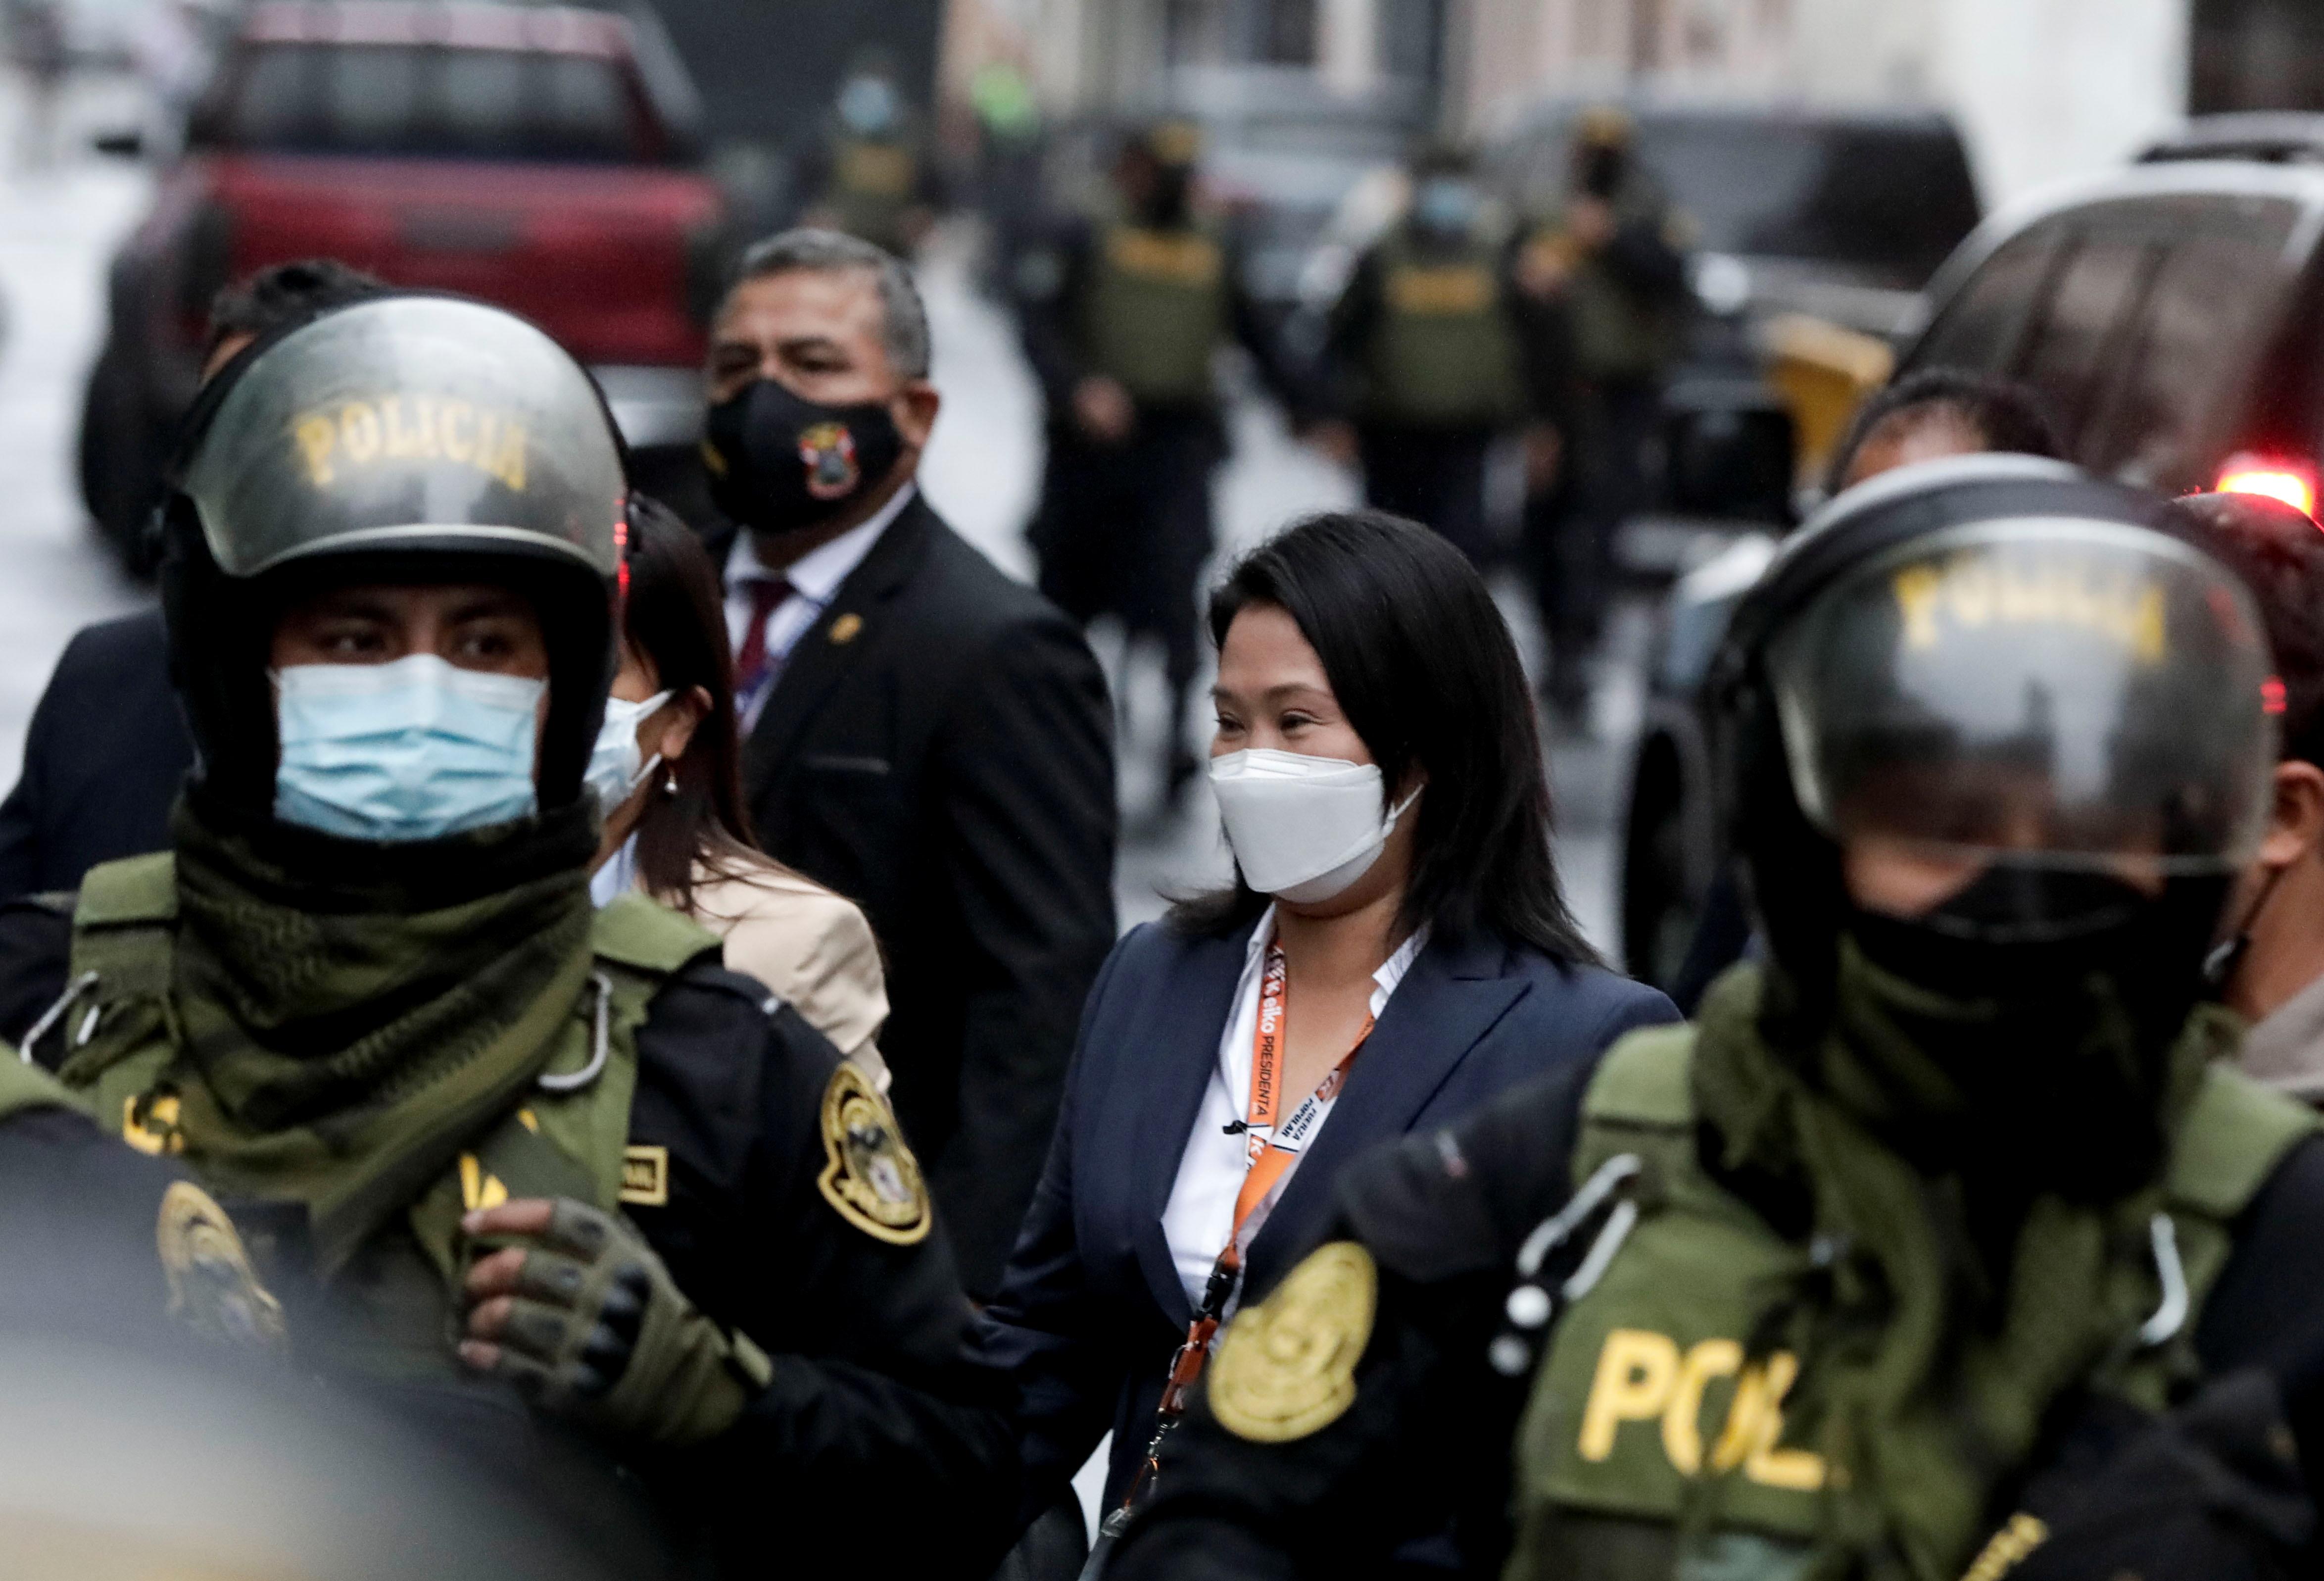 Peru's presidential candidate Keiko Fujimori leaves the National Court of Tacna Avenue in Lima, Peru, June 21, 2021. REUTERS/Angela Ponce